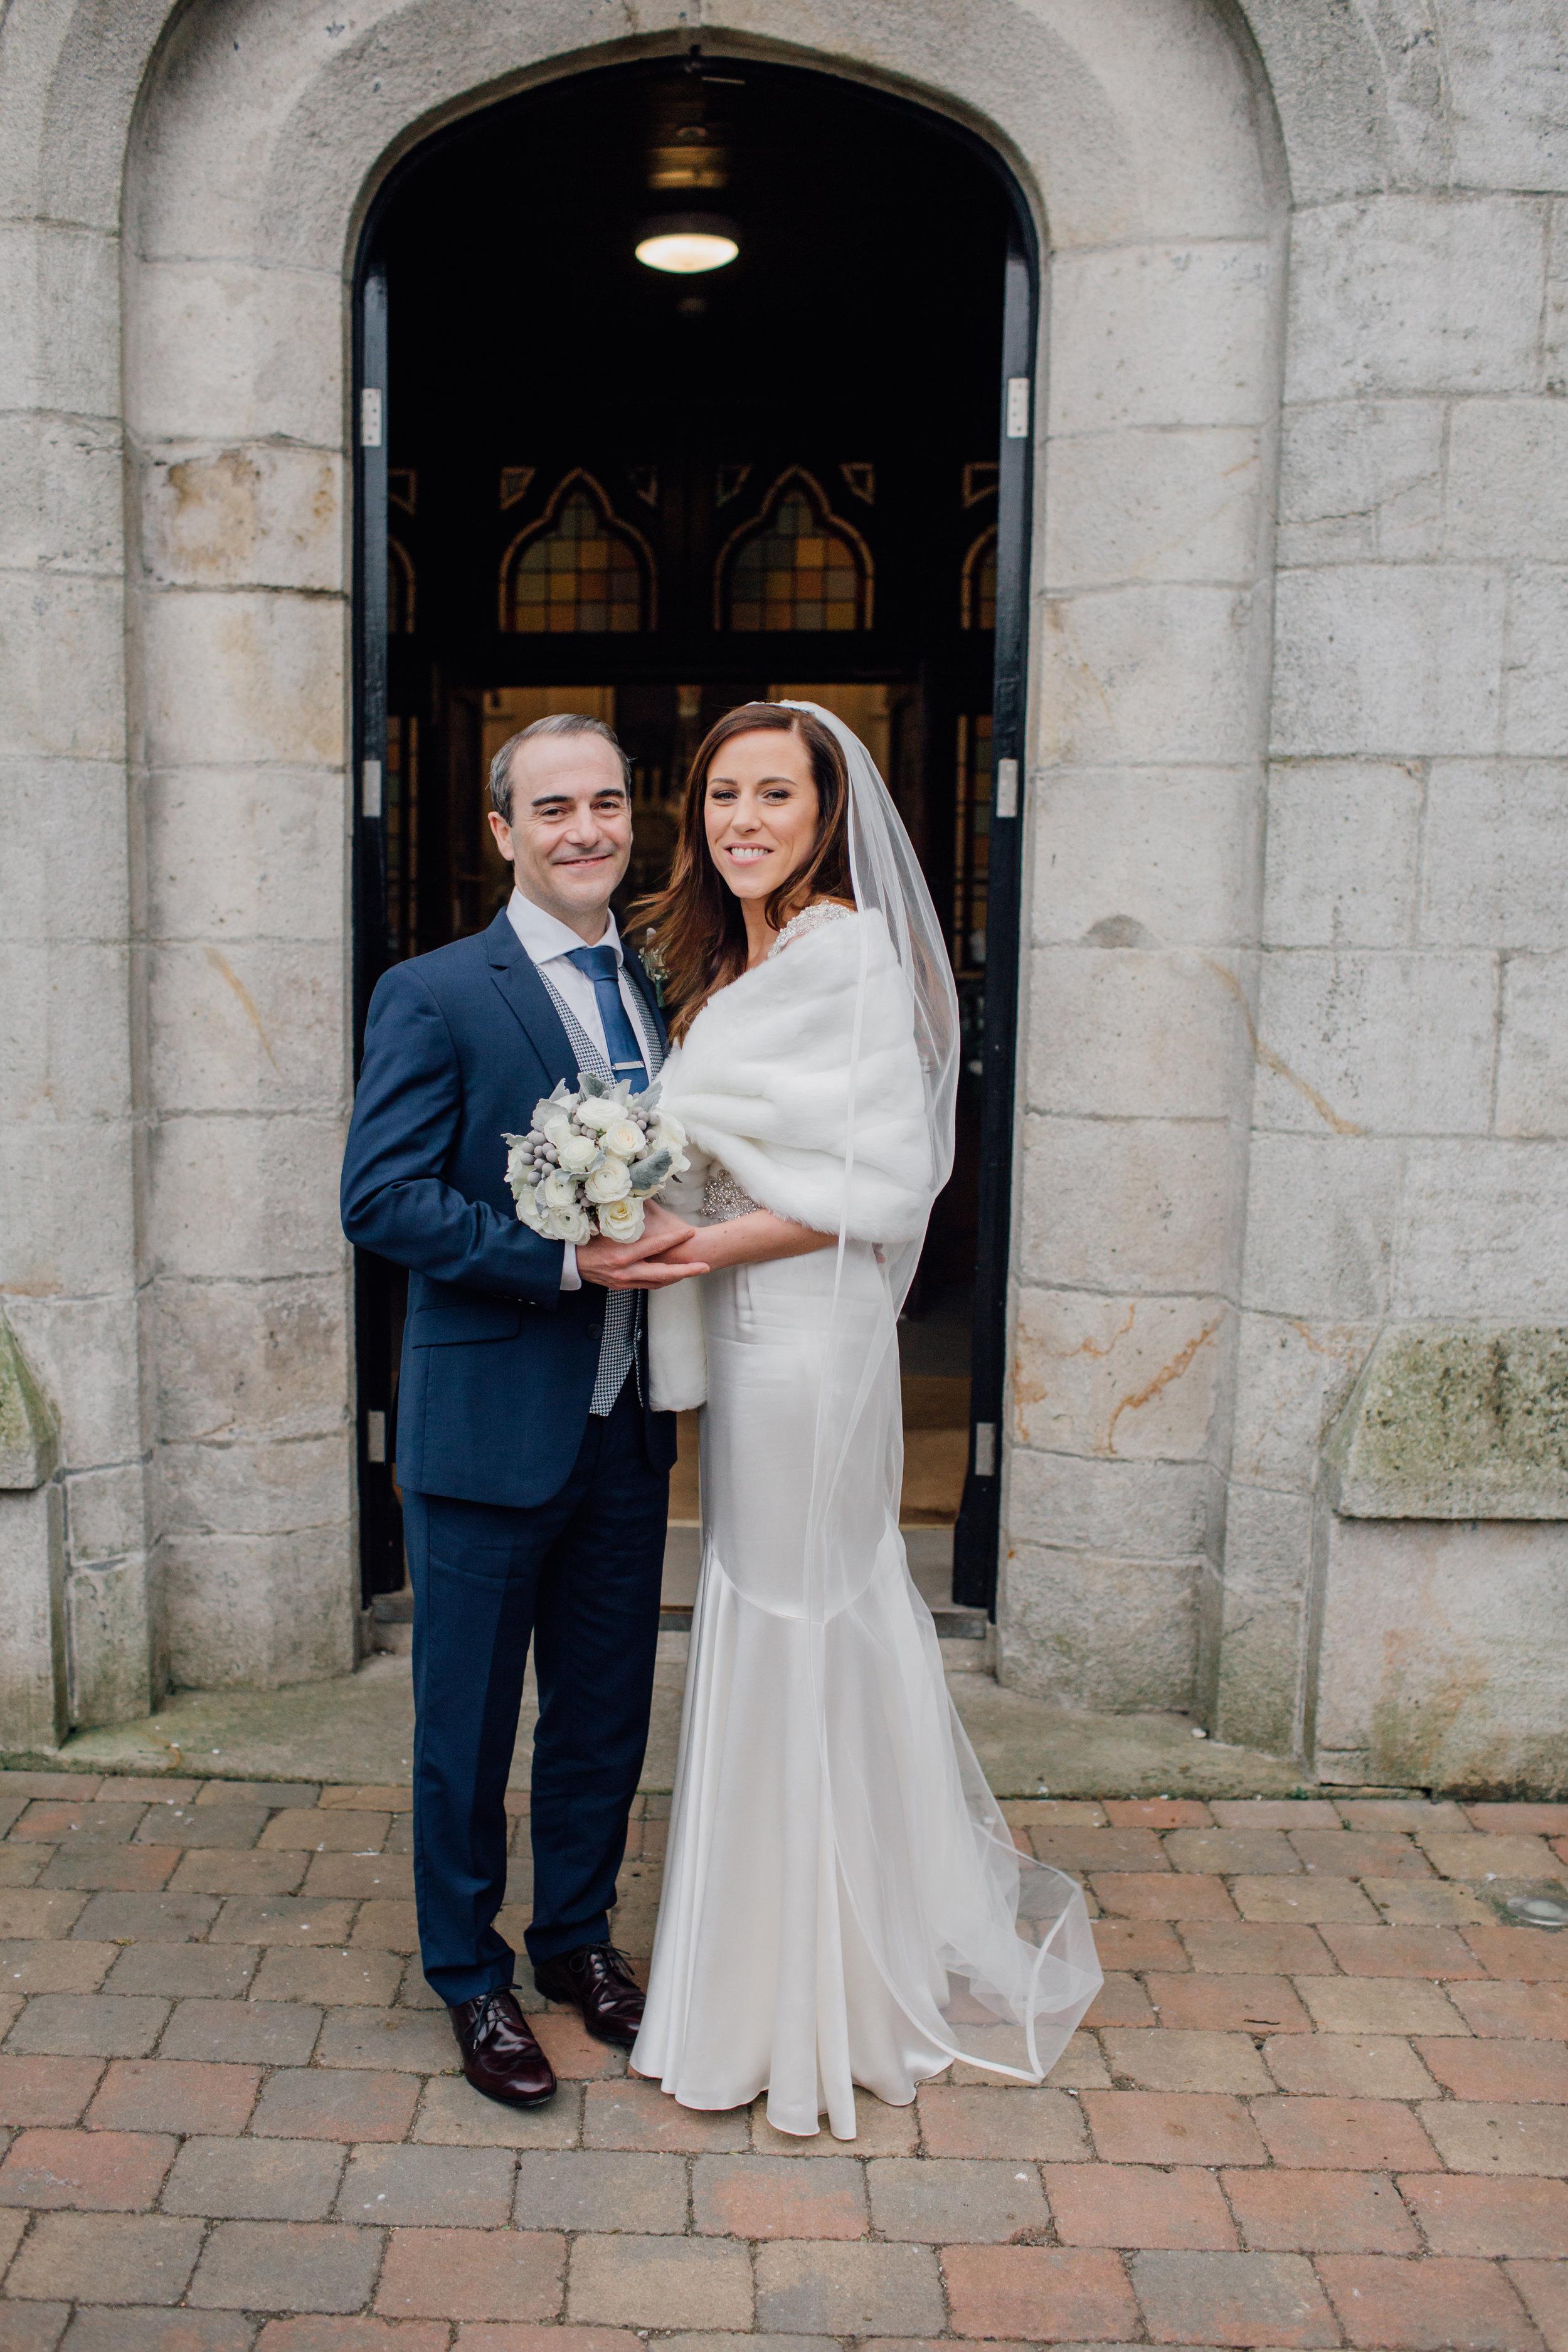 Mr and Mrs Finn